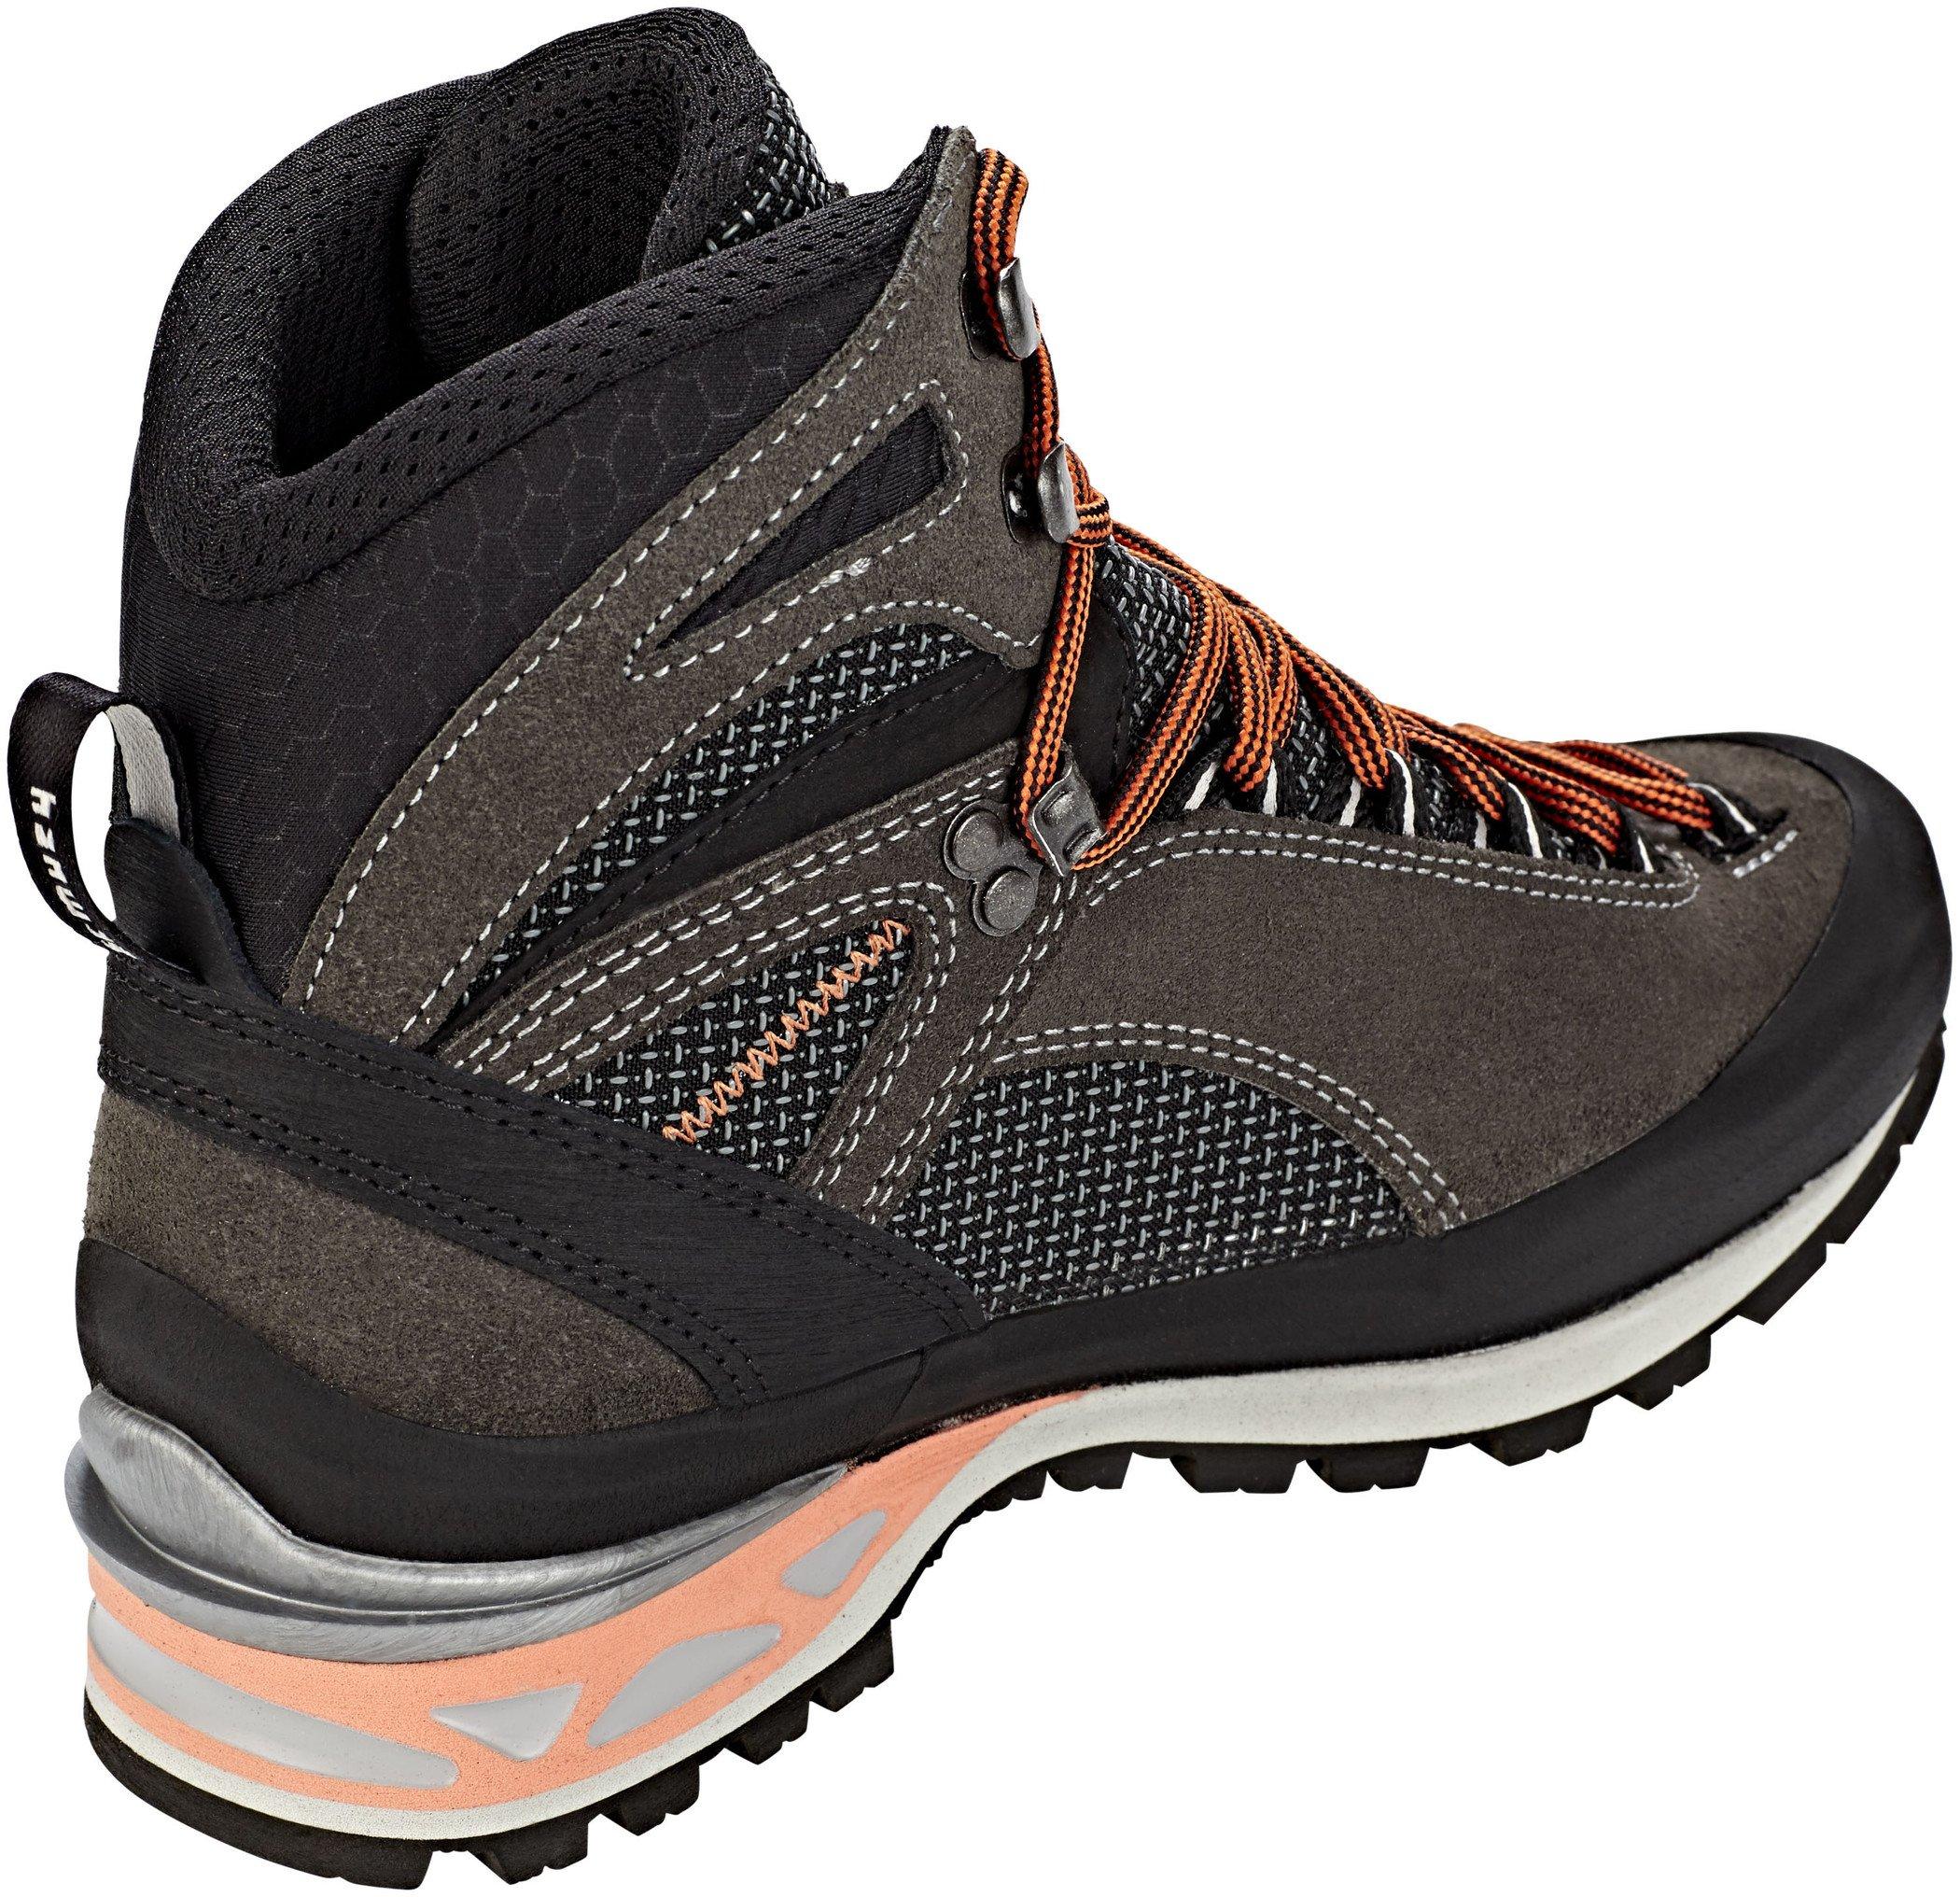 Hanwag Makra Combi GTX Shoes Women Asphalt/orink 2020